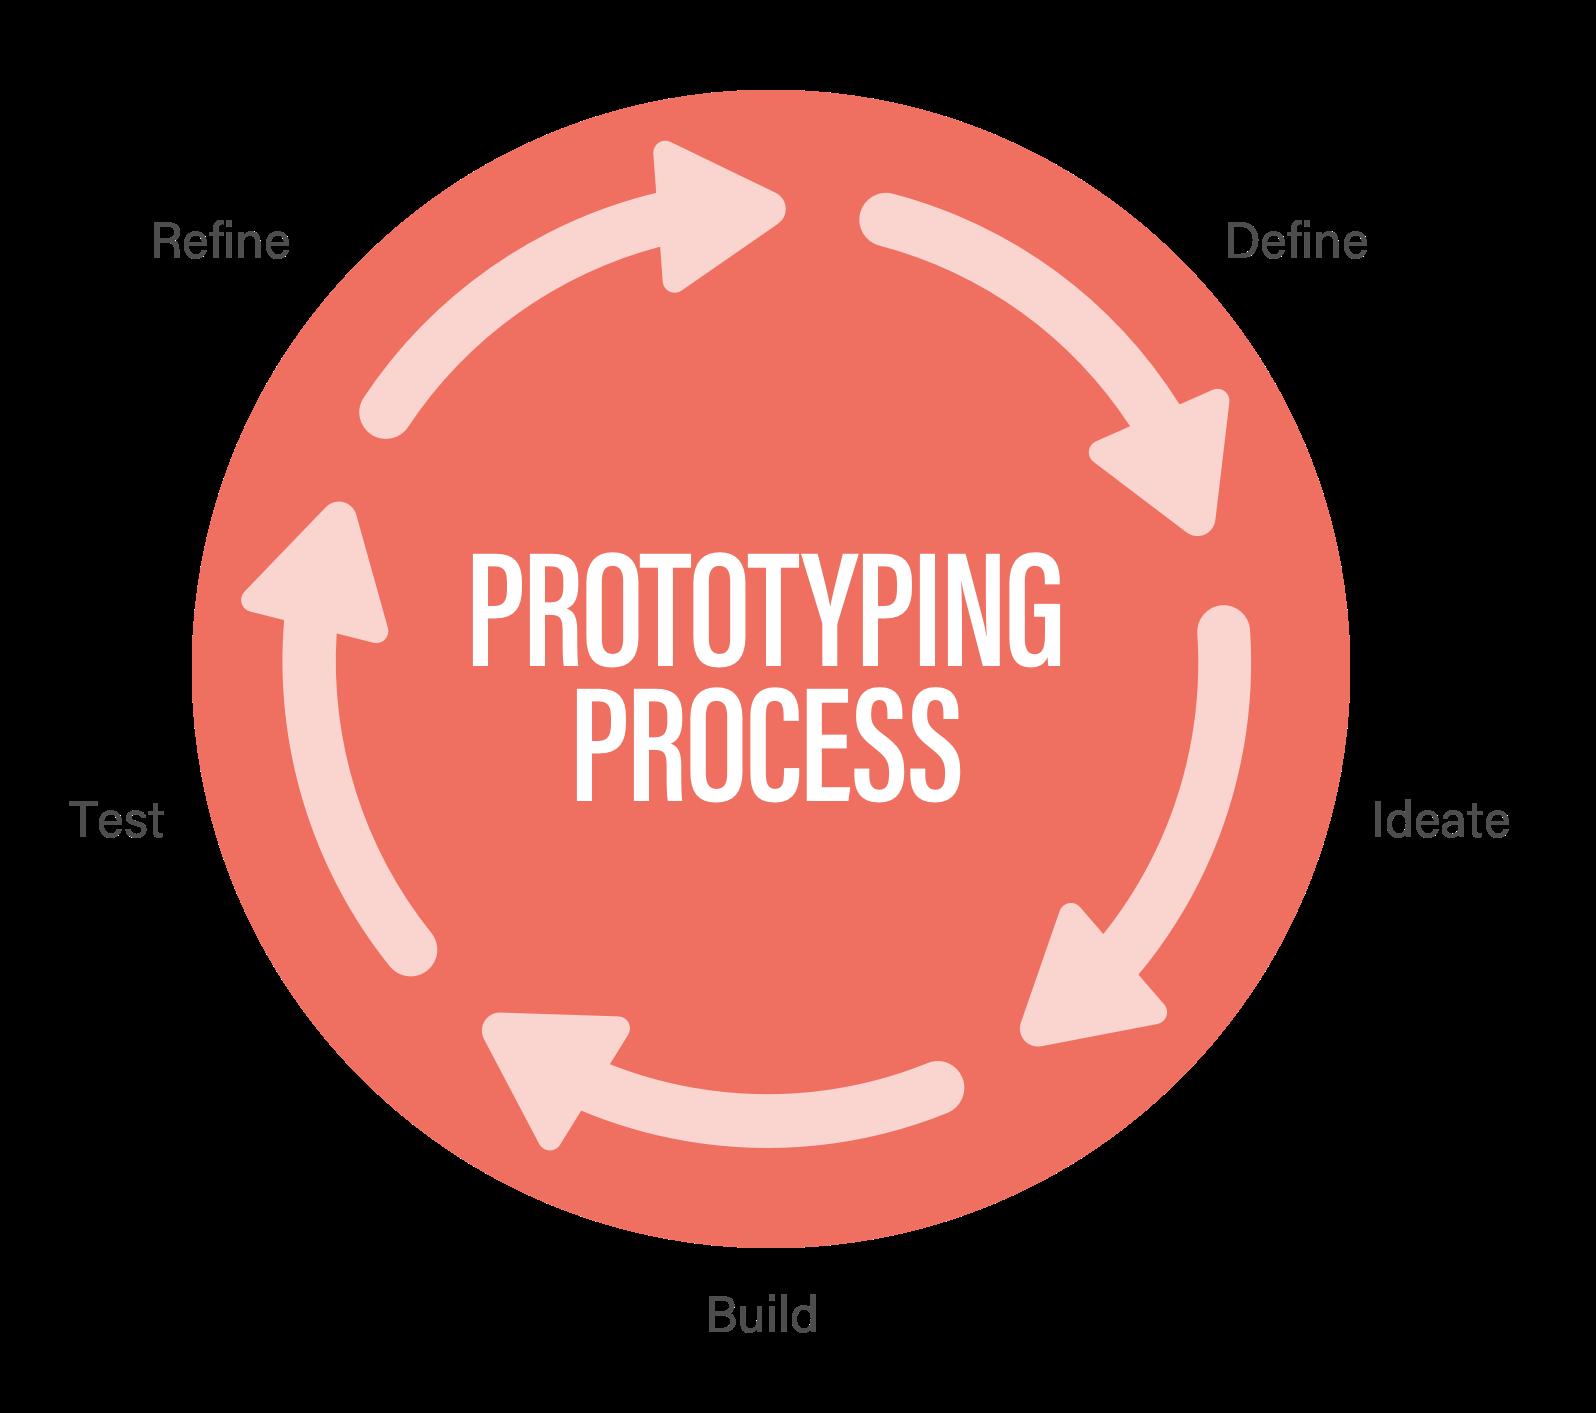 Prototyping Process - Define > Ideate > Build > Test > Refine